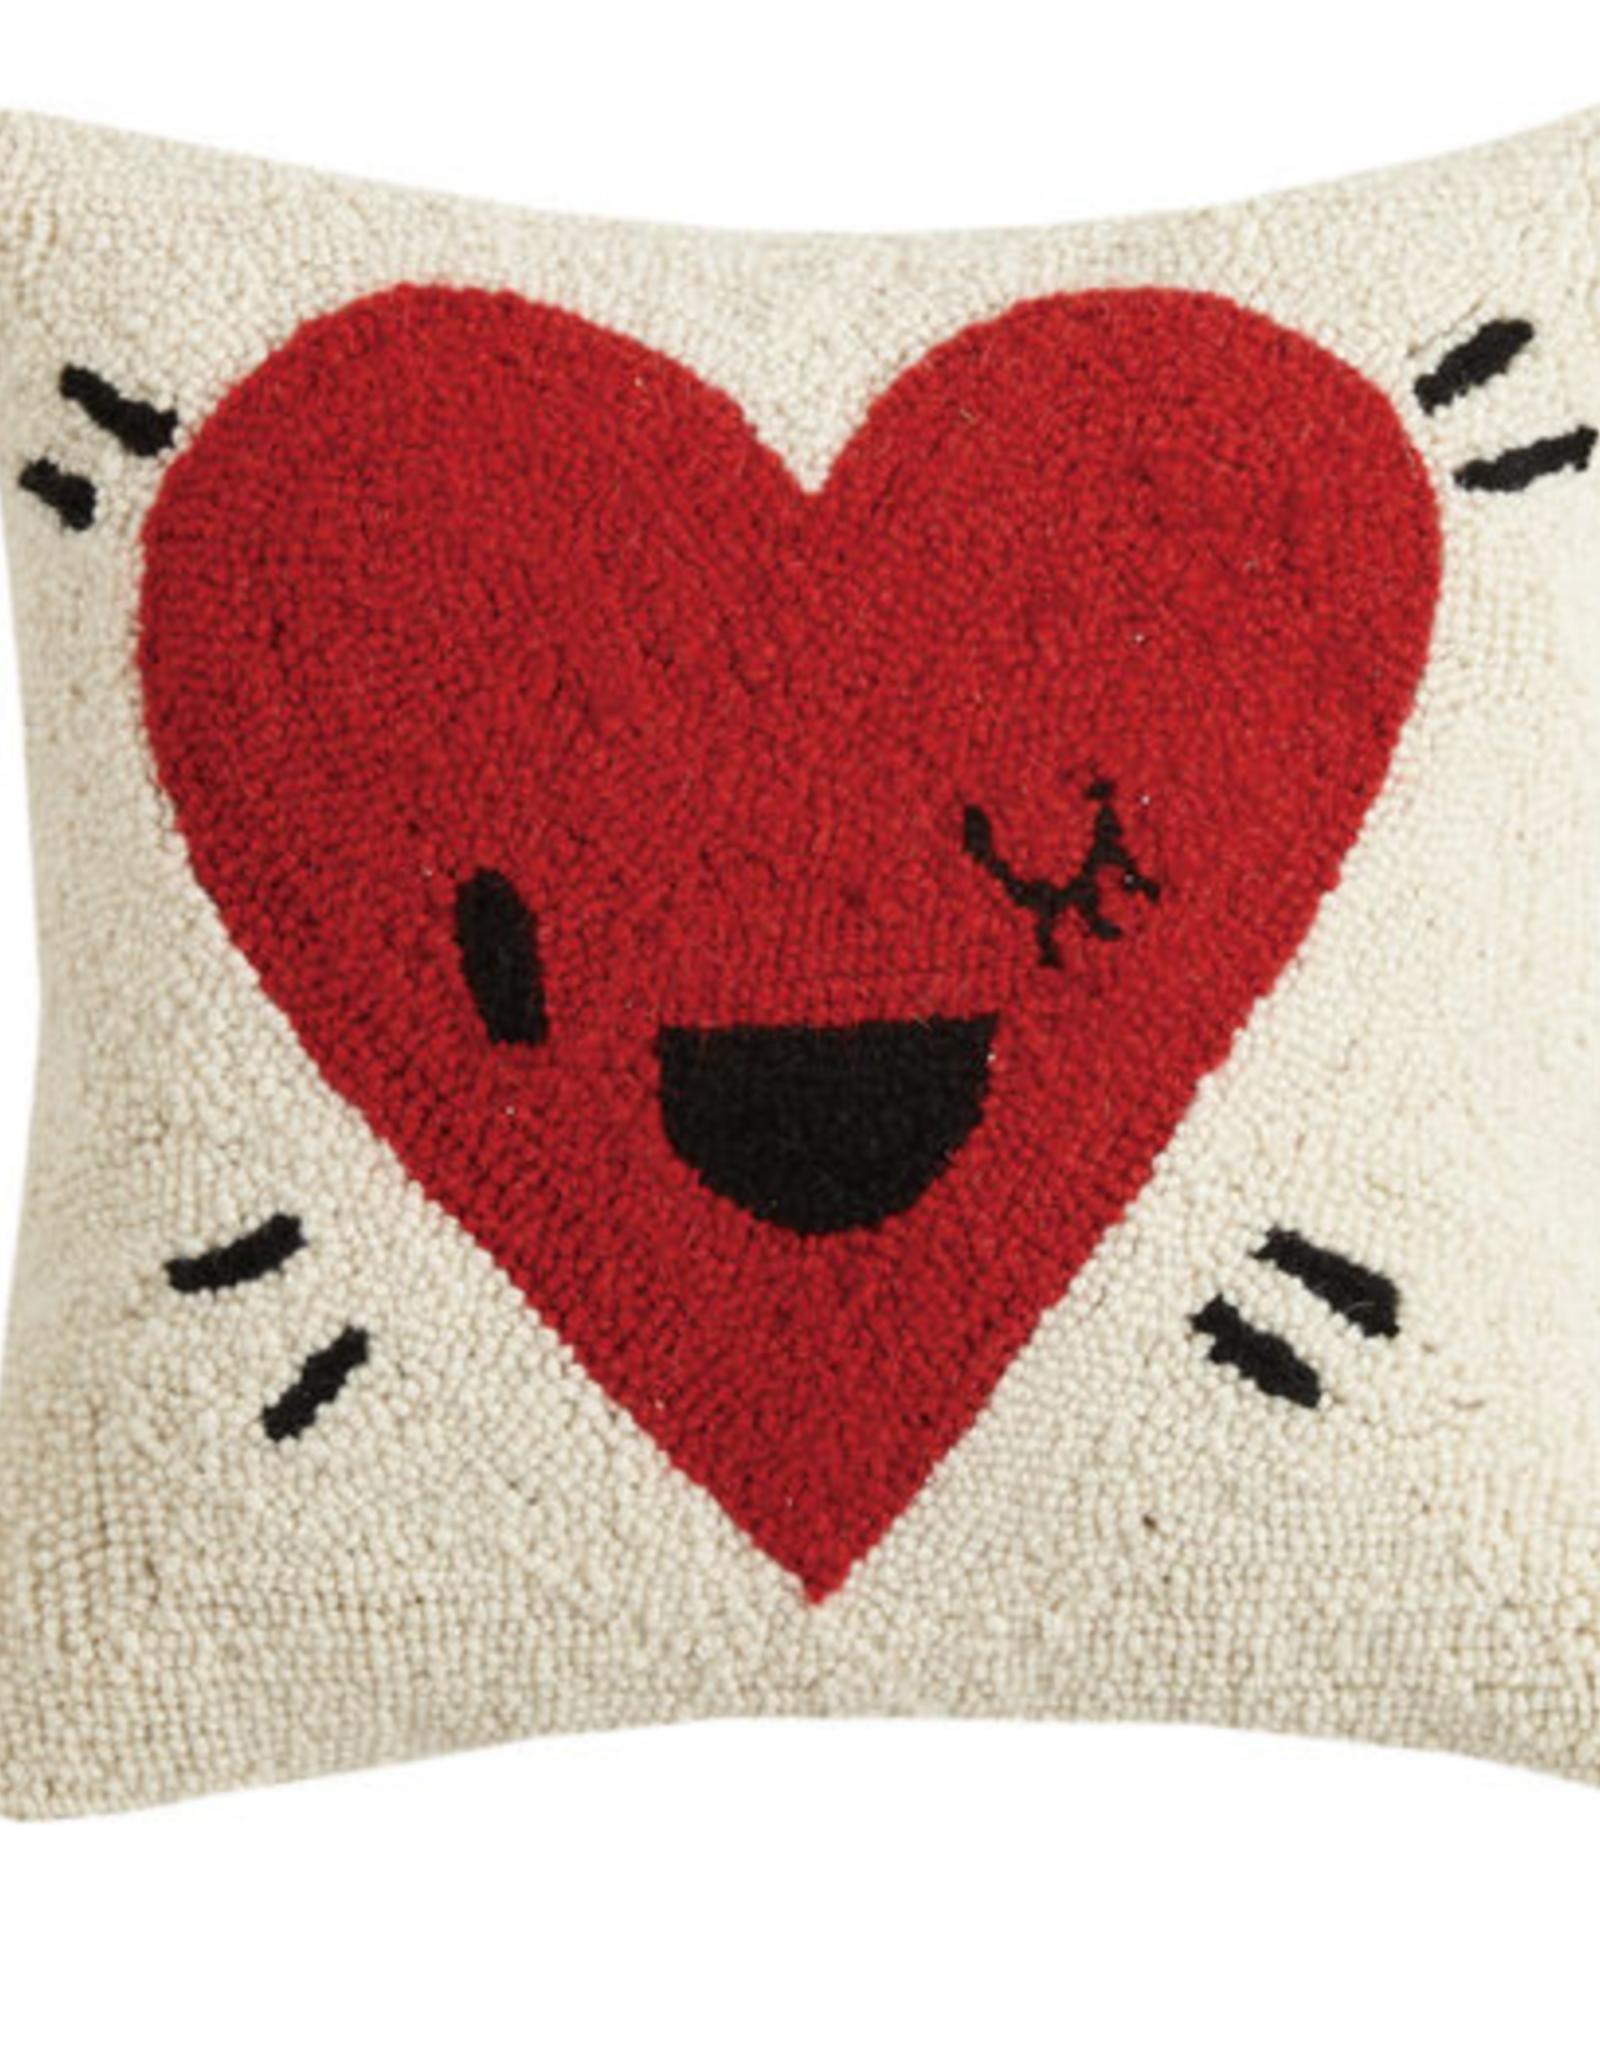 Peking Handicraft Heart Wink Handcrafted Hook Pillow